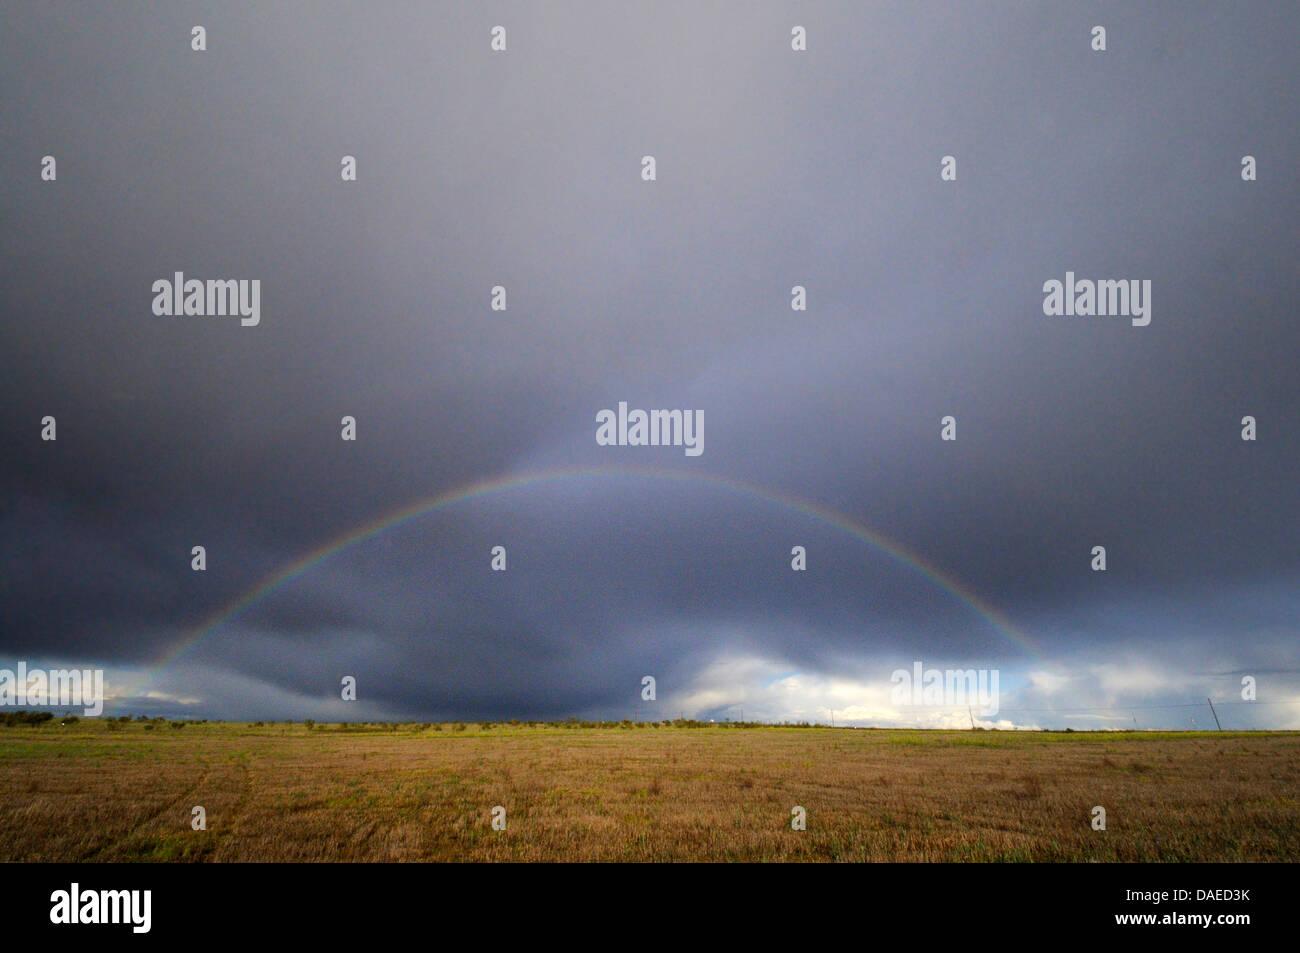 rainbow and dark clouds over steppe, Spain, Extremadura, Talavan - Stock Image